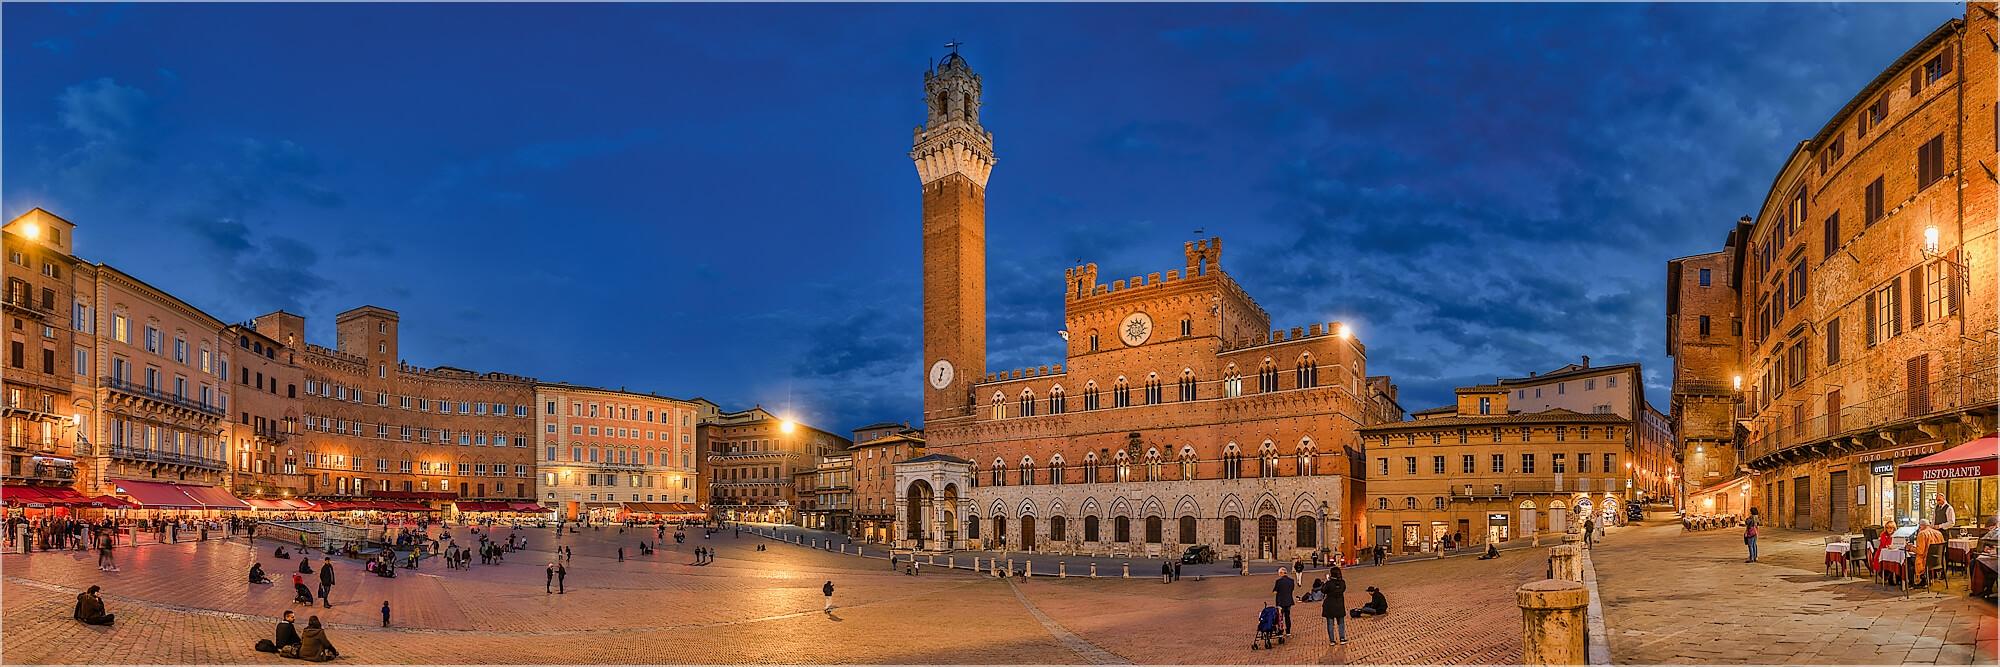 Panoramafoto Piazza del Campo Siena Toskana Italien